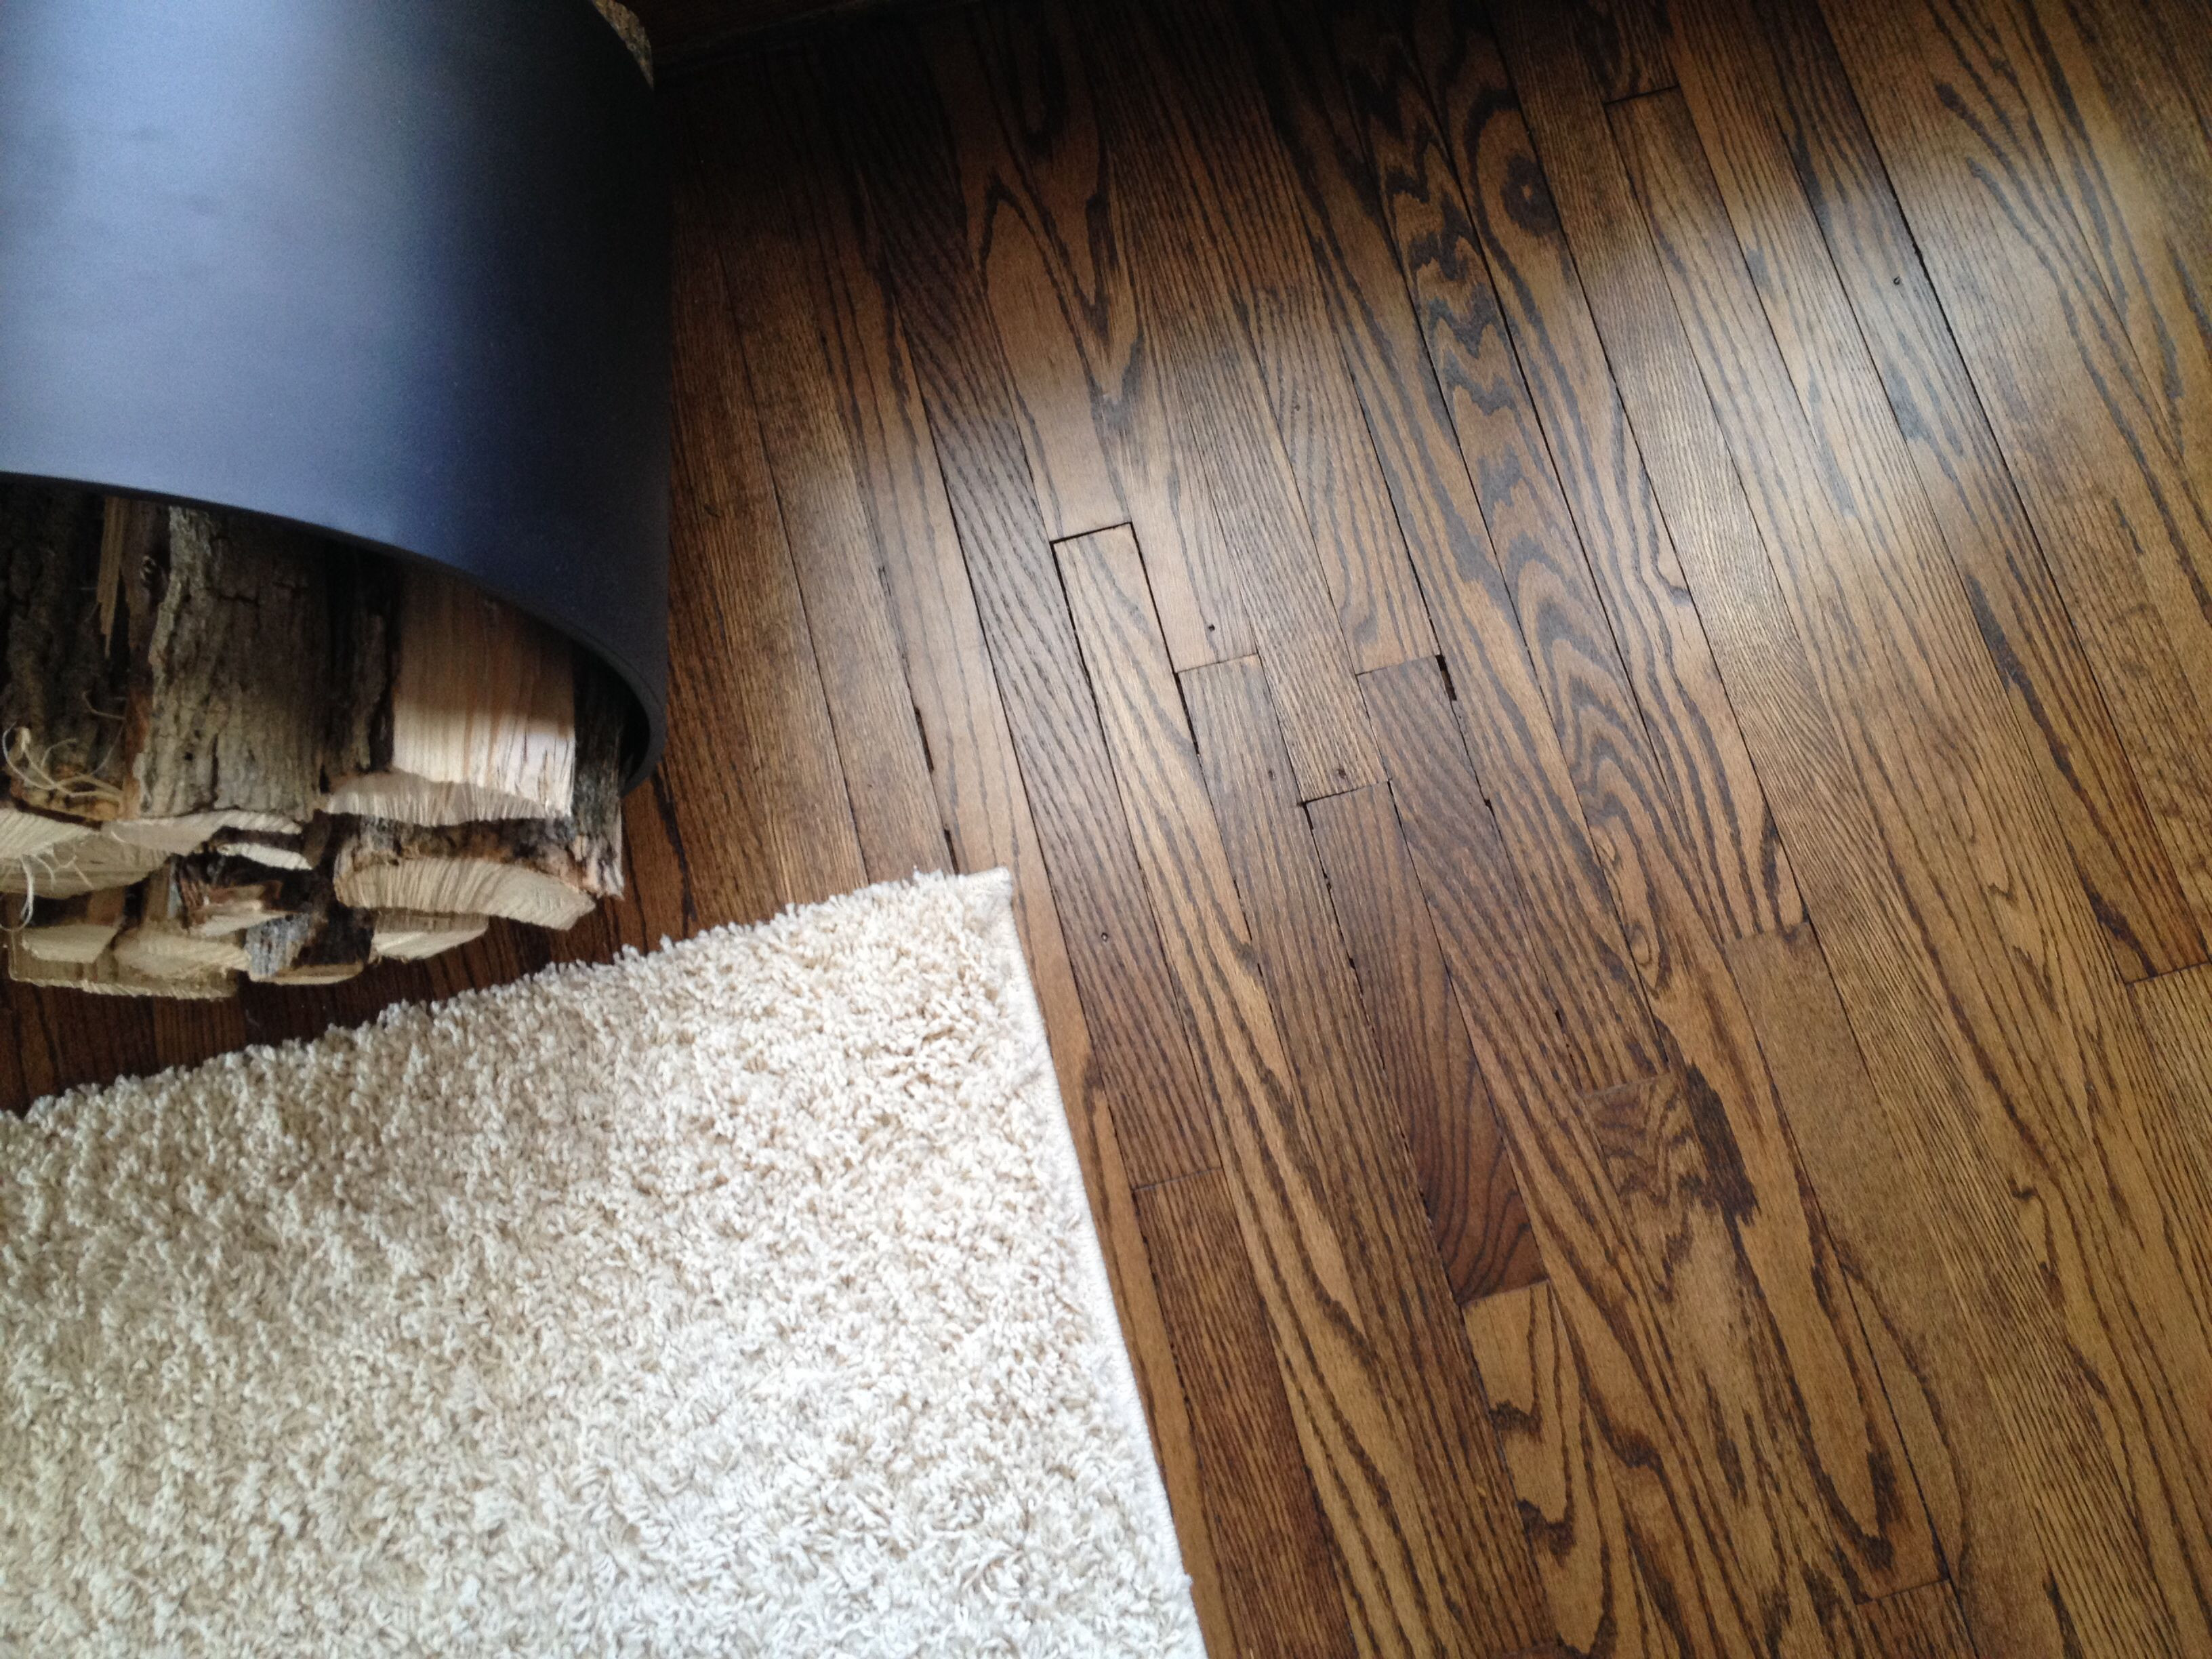 hardwood floor refinishing colors of 113 year old original oak floors refinished in espresso stain pertaining to 113 year old original oak floors refinished in espresso stain